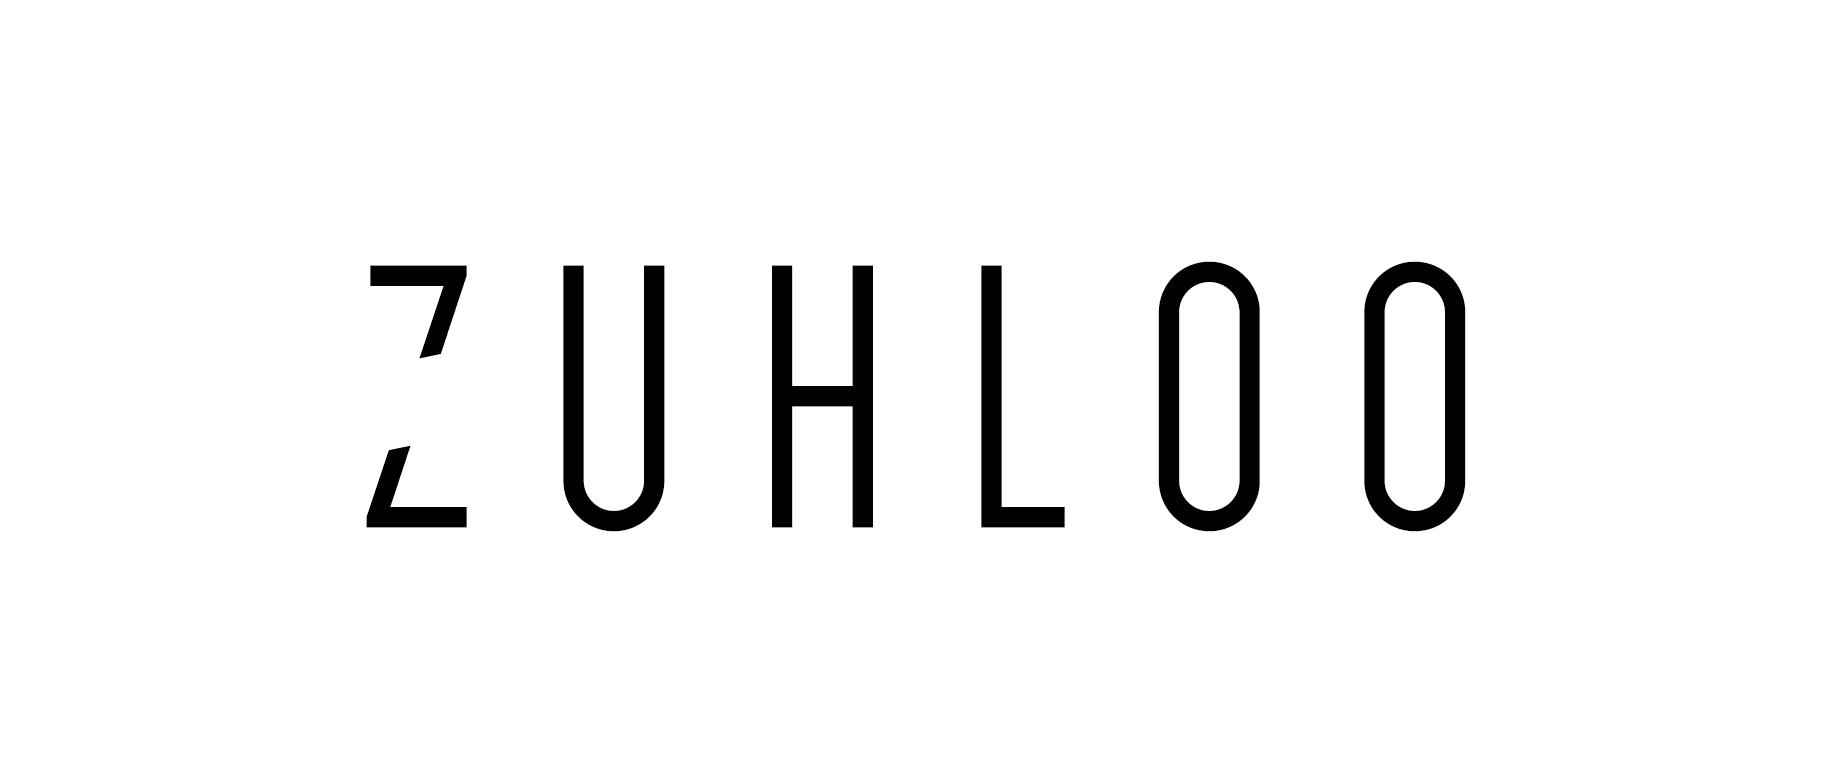 Zuhloo